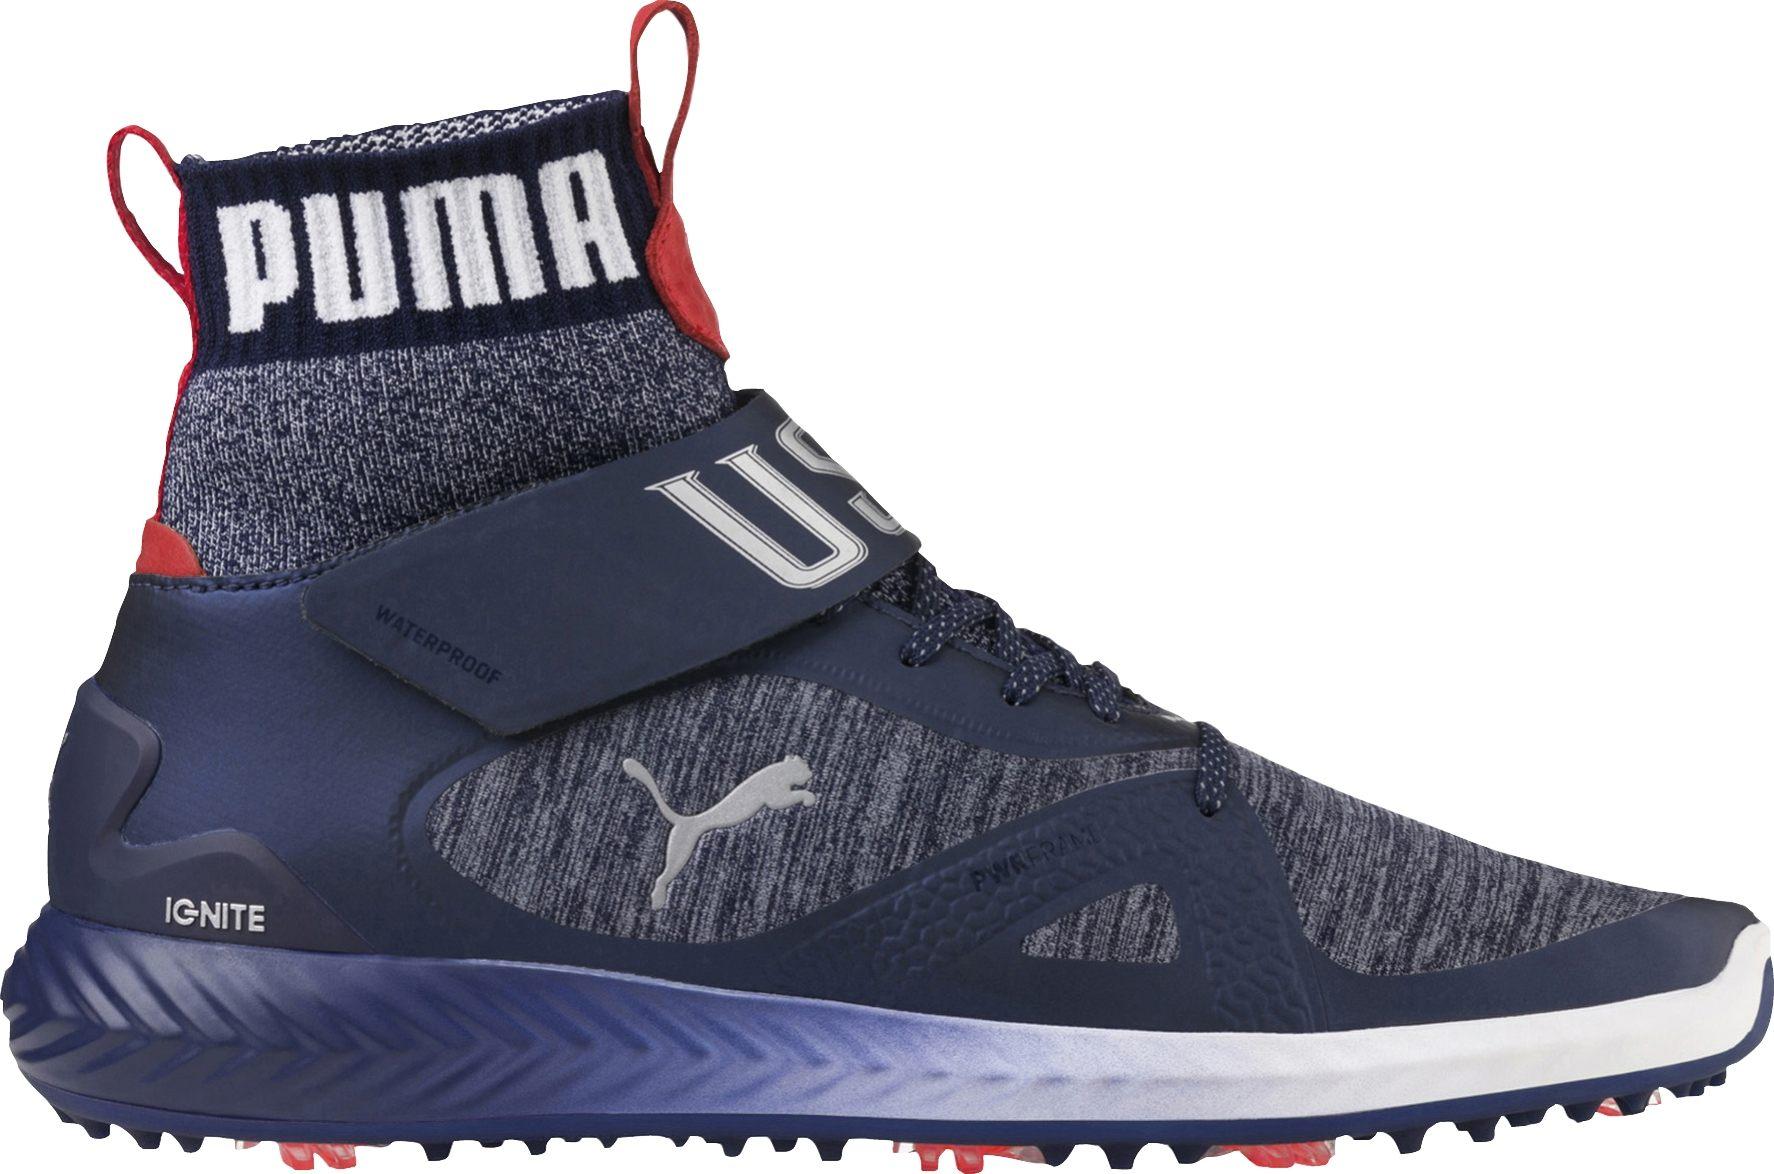 separation shoes fd4e9 5cad7 Puma Golf Limited Edition Ryder Cup Ignite PWRADAPT Hi-Top Team USA Shoes    RockBottomGolf.com